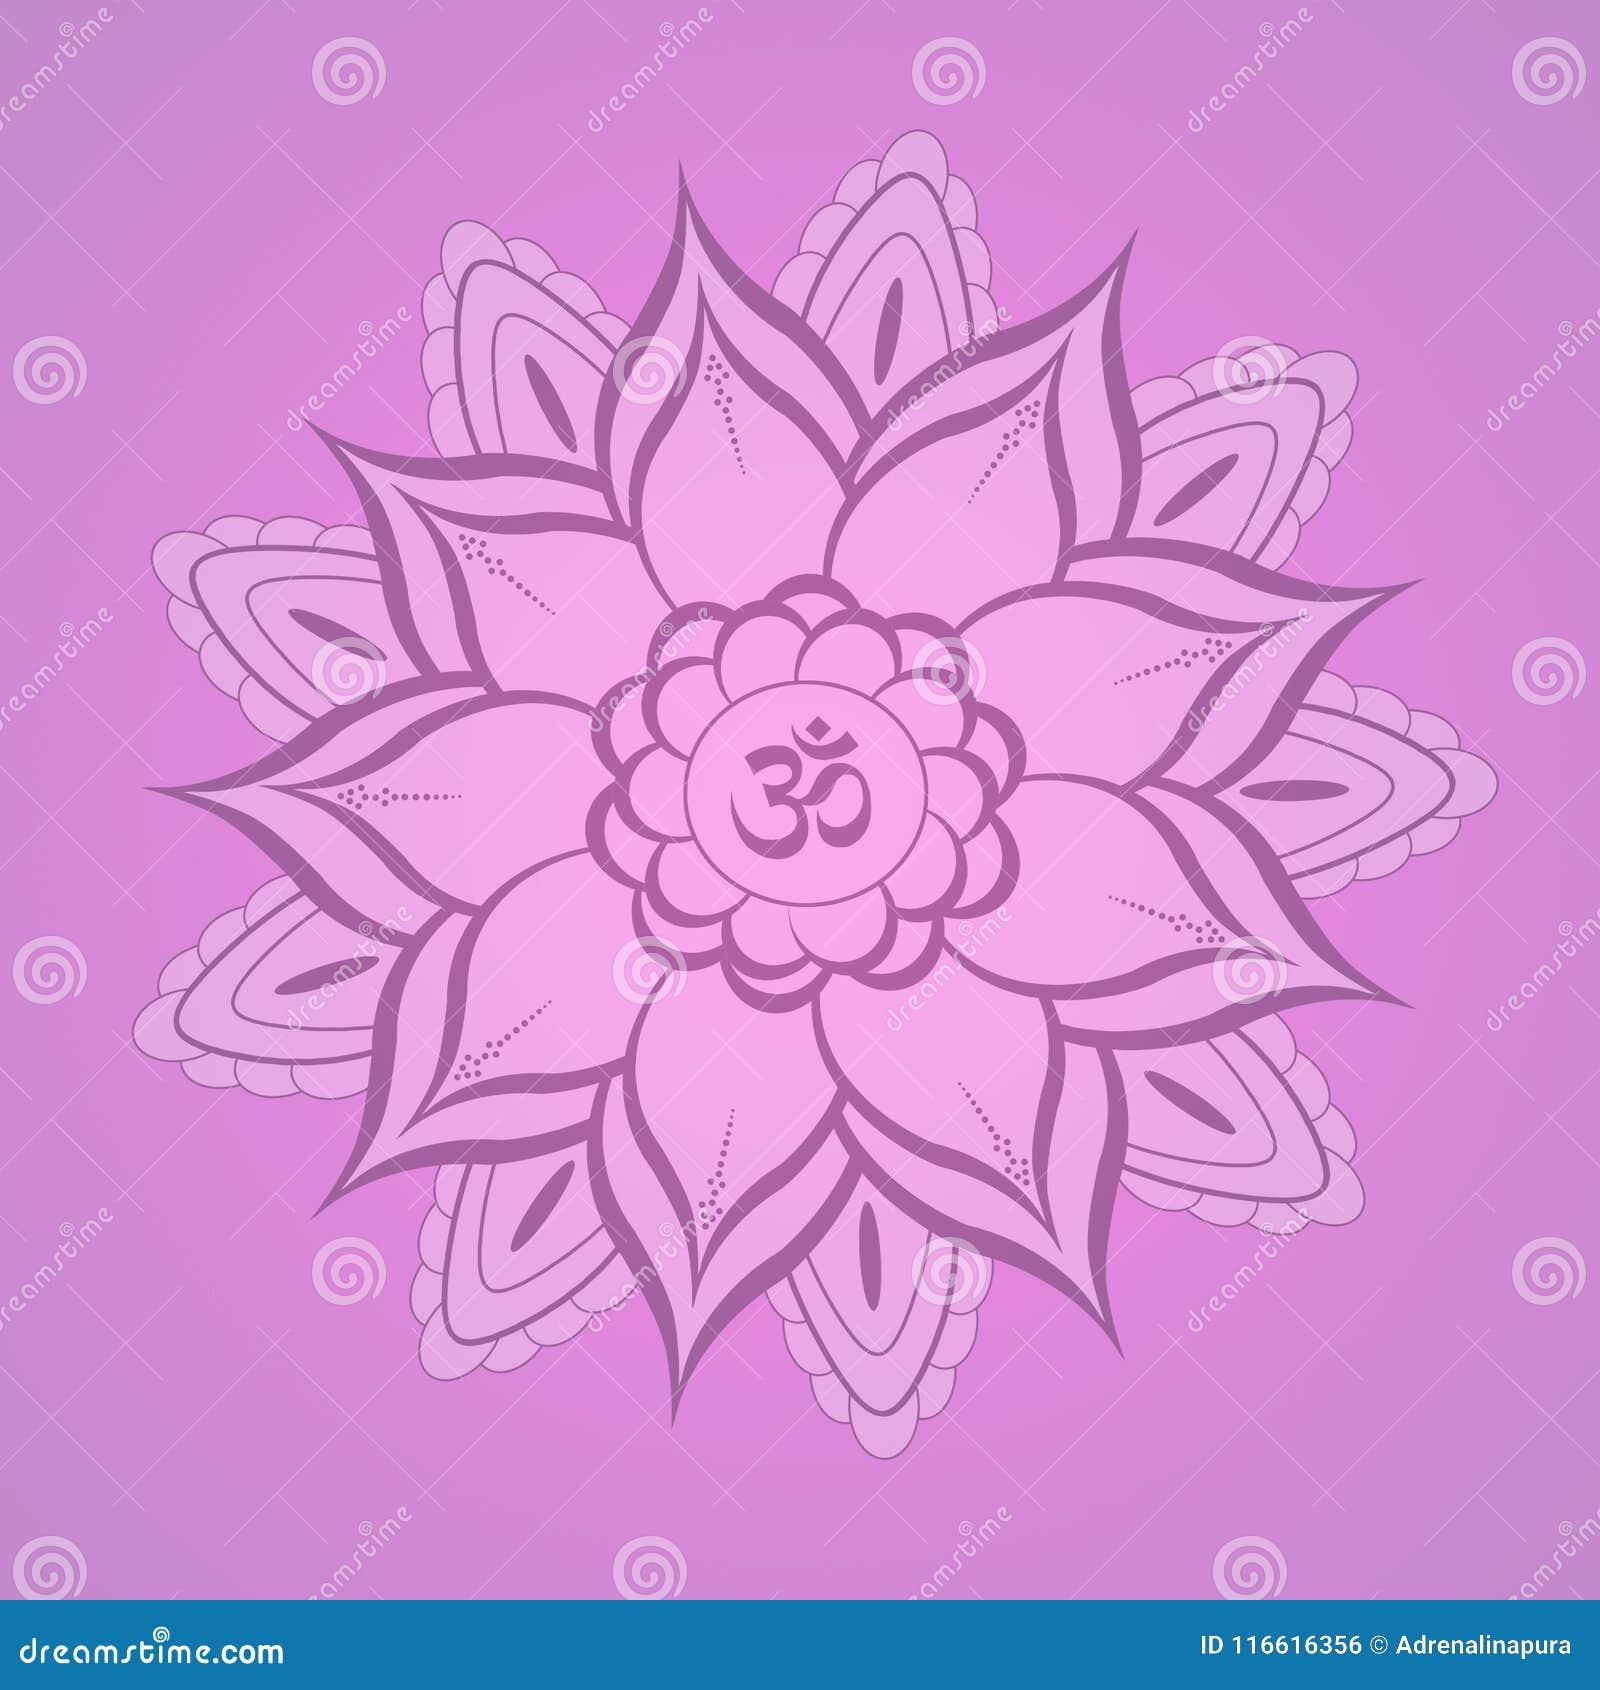 Lotus Flower Yoga Symbol Stock Illustration Illustration Of Yoga